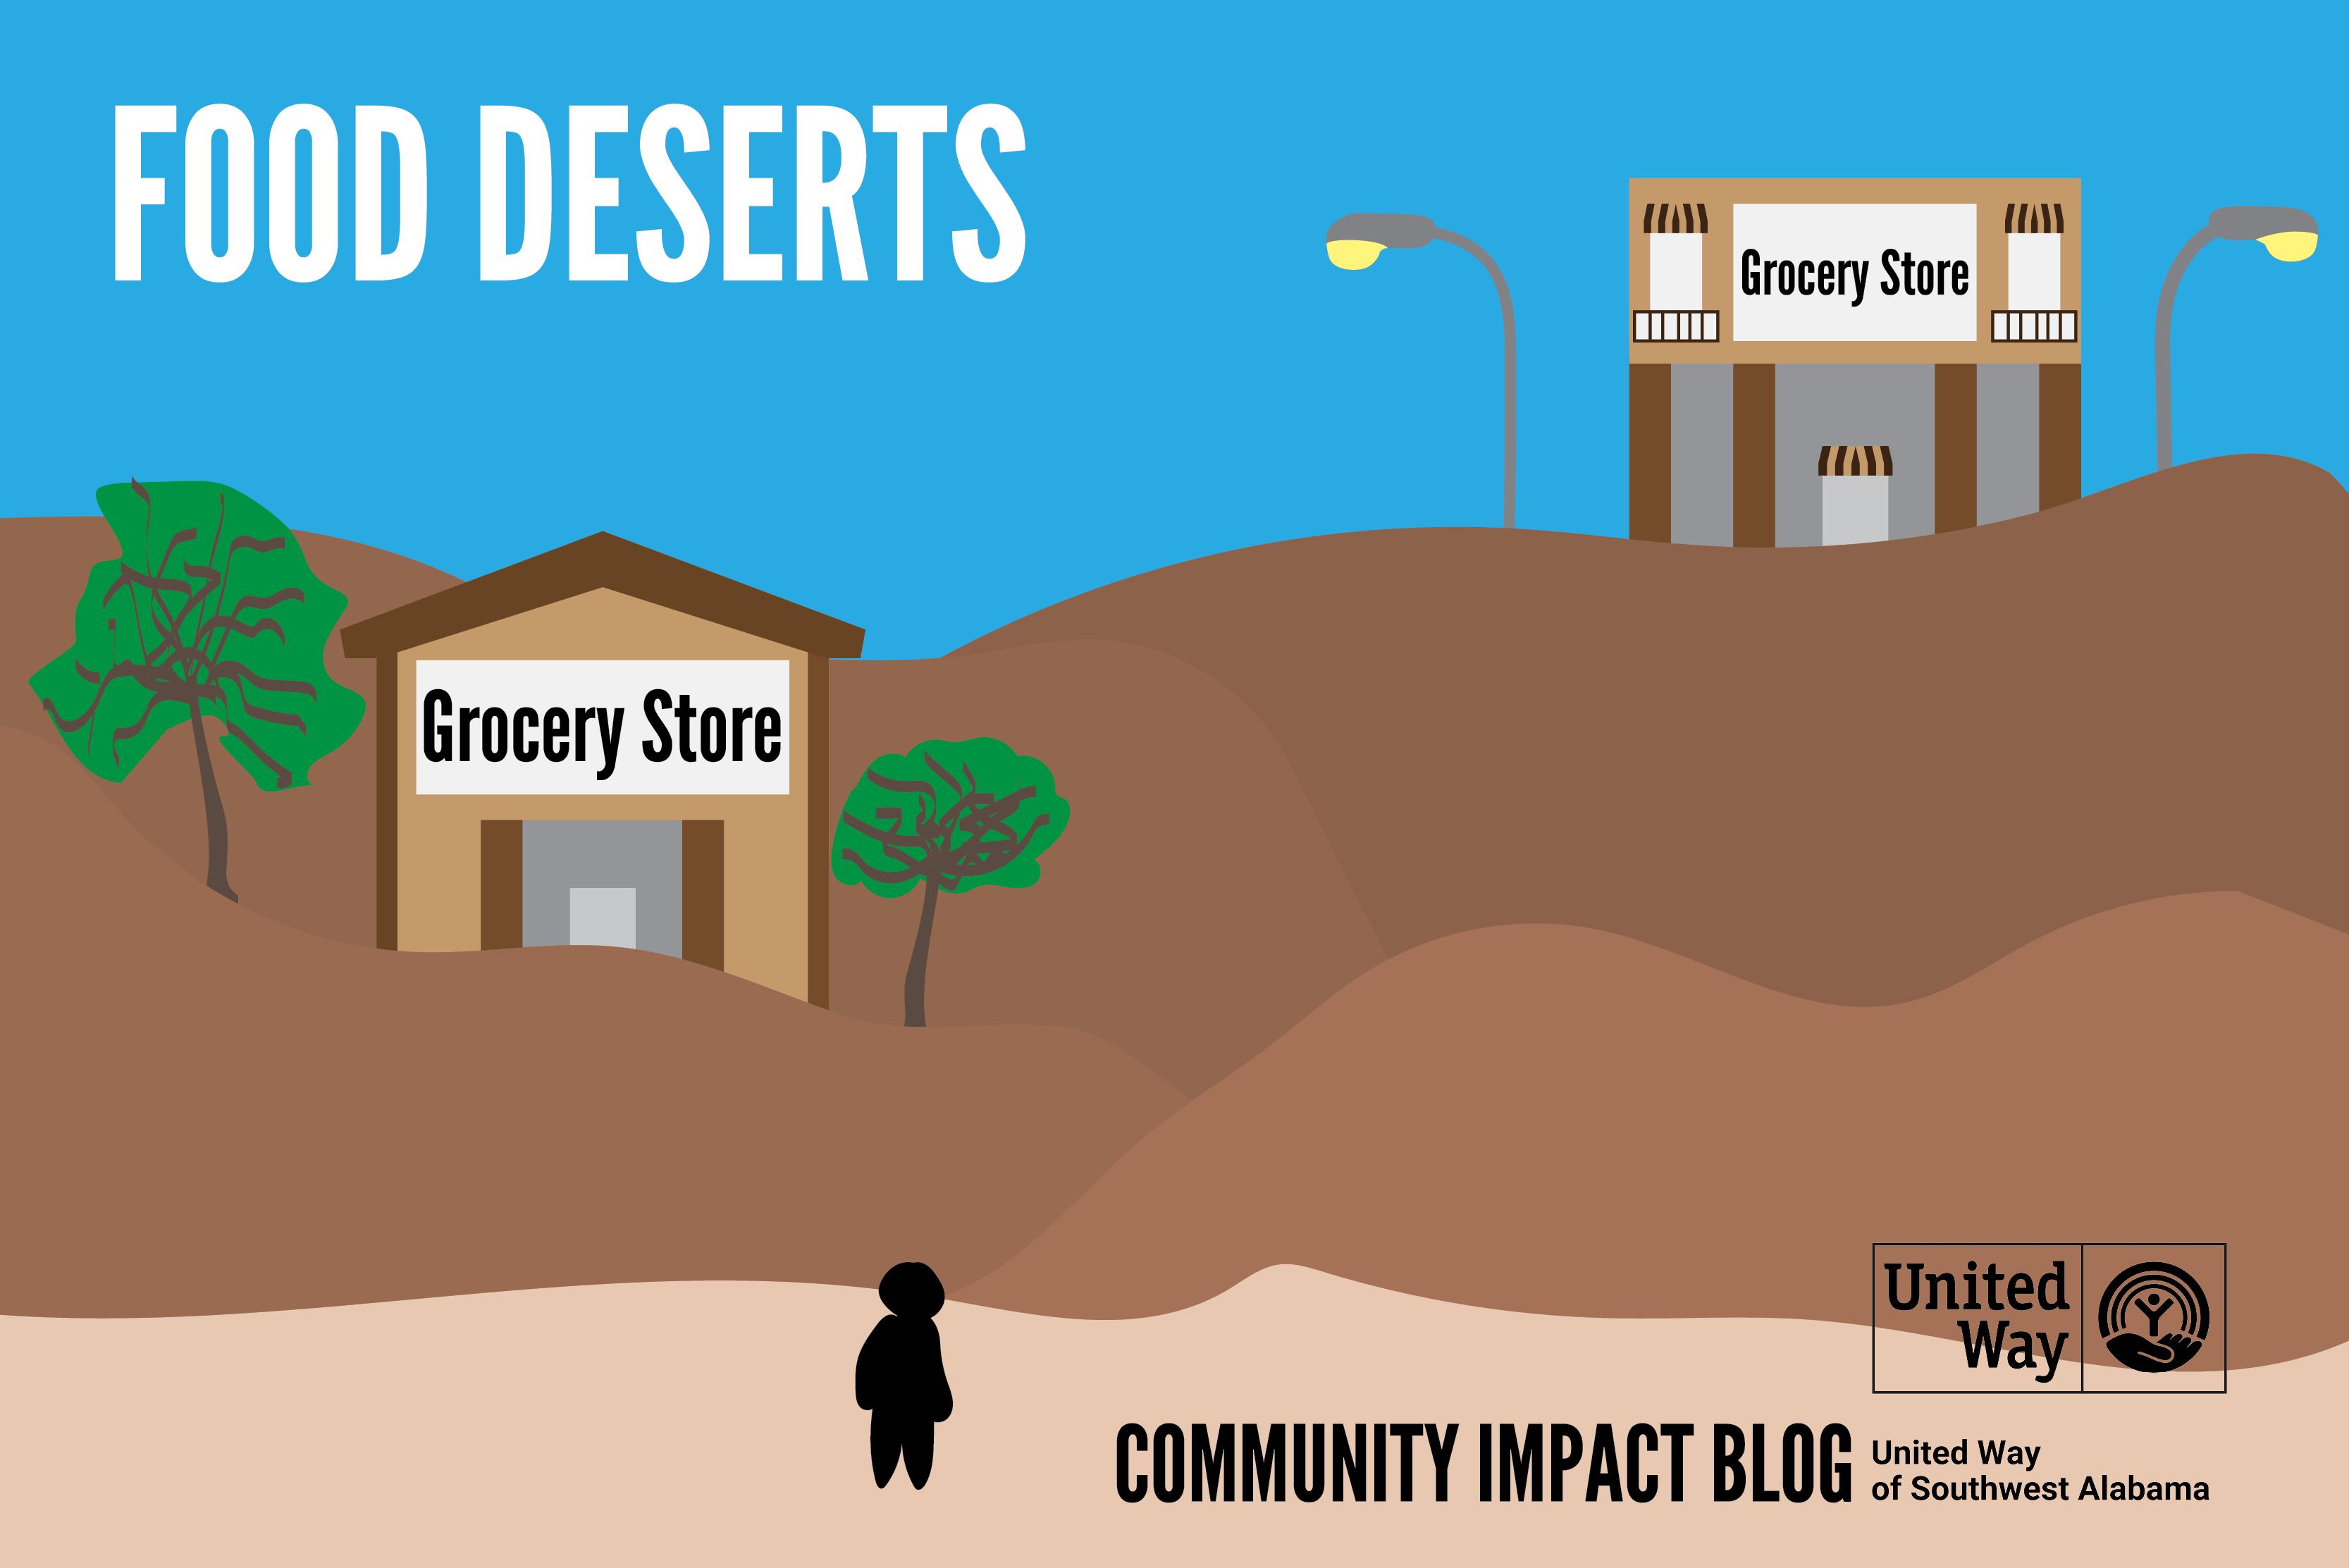 Community Impact July Blog - Food Deserts